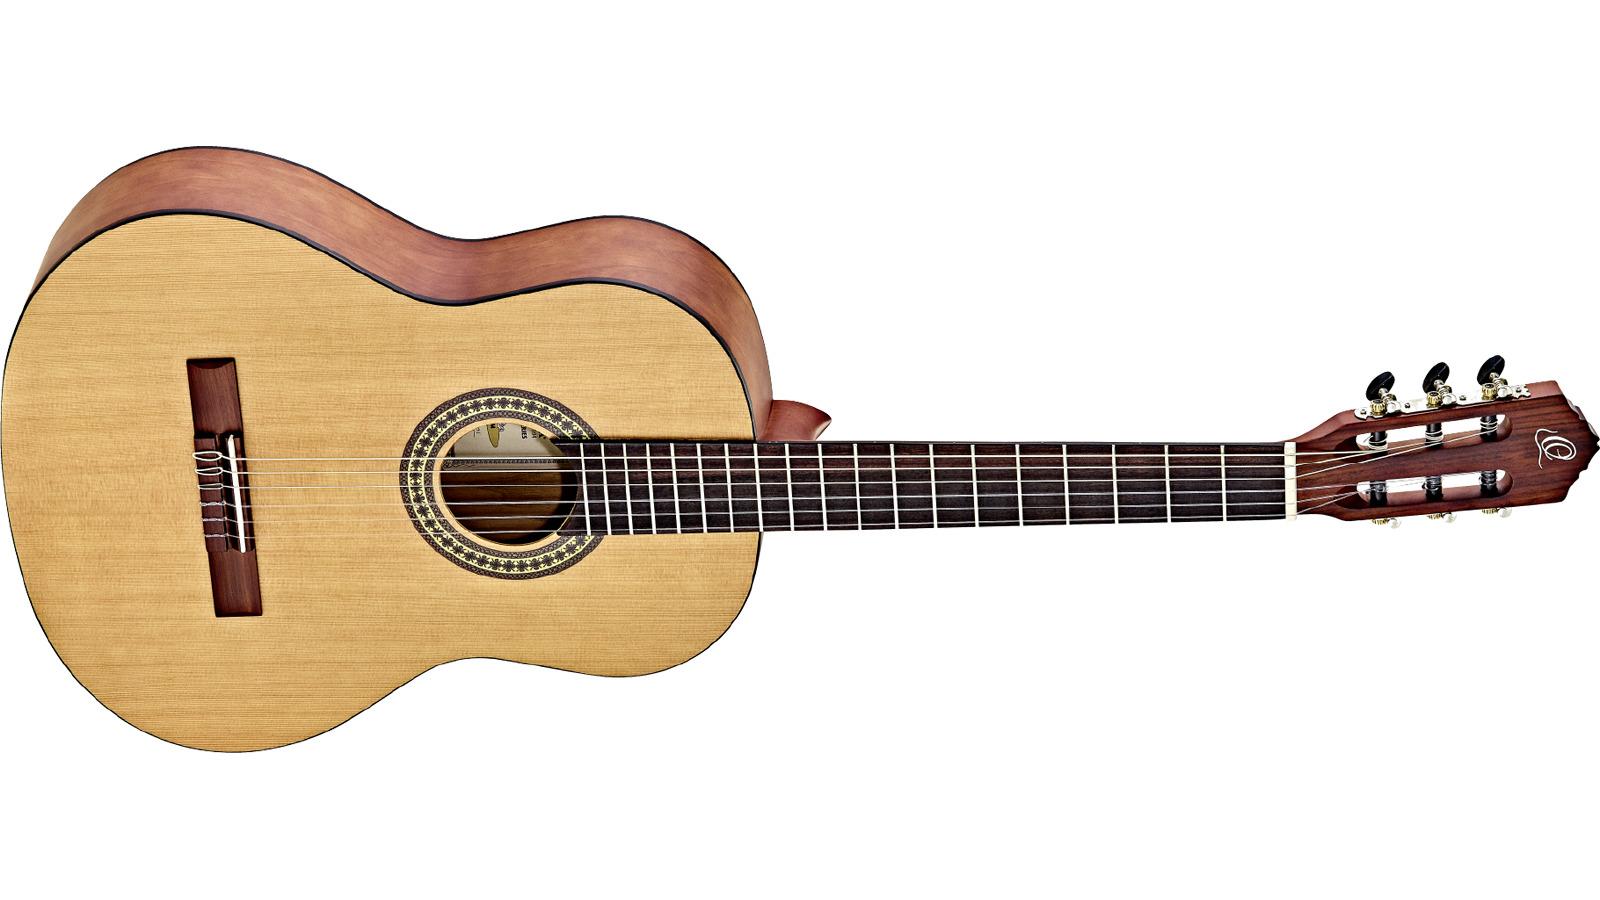 Ortega RSTC5M 4/4 Konzertgitarre